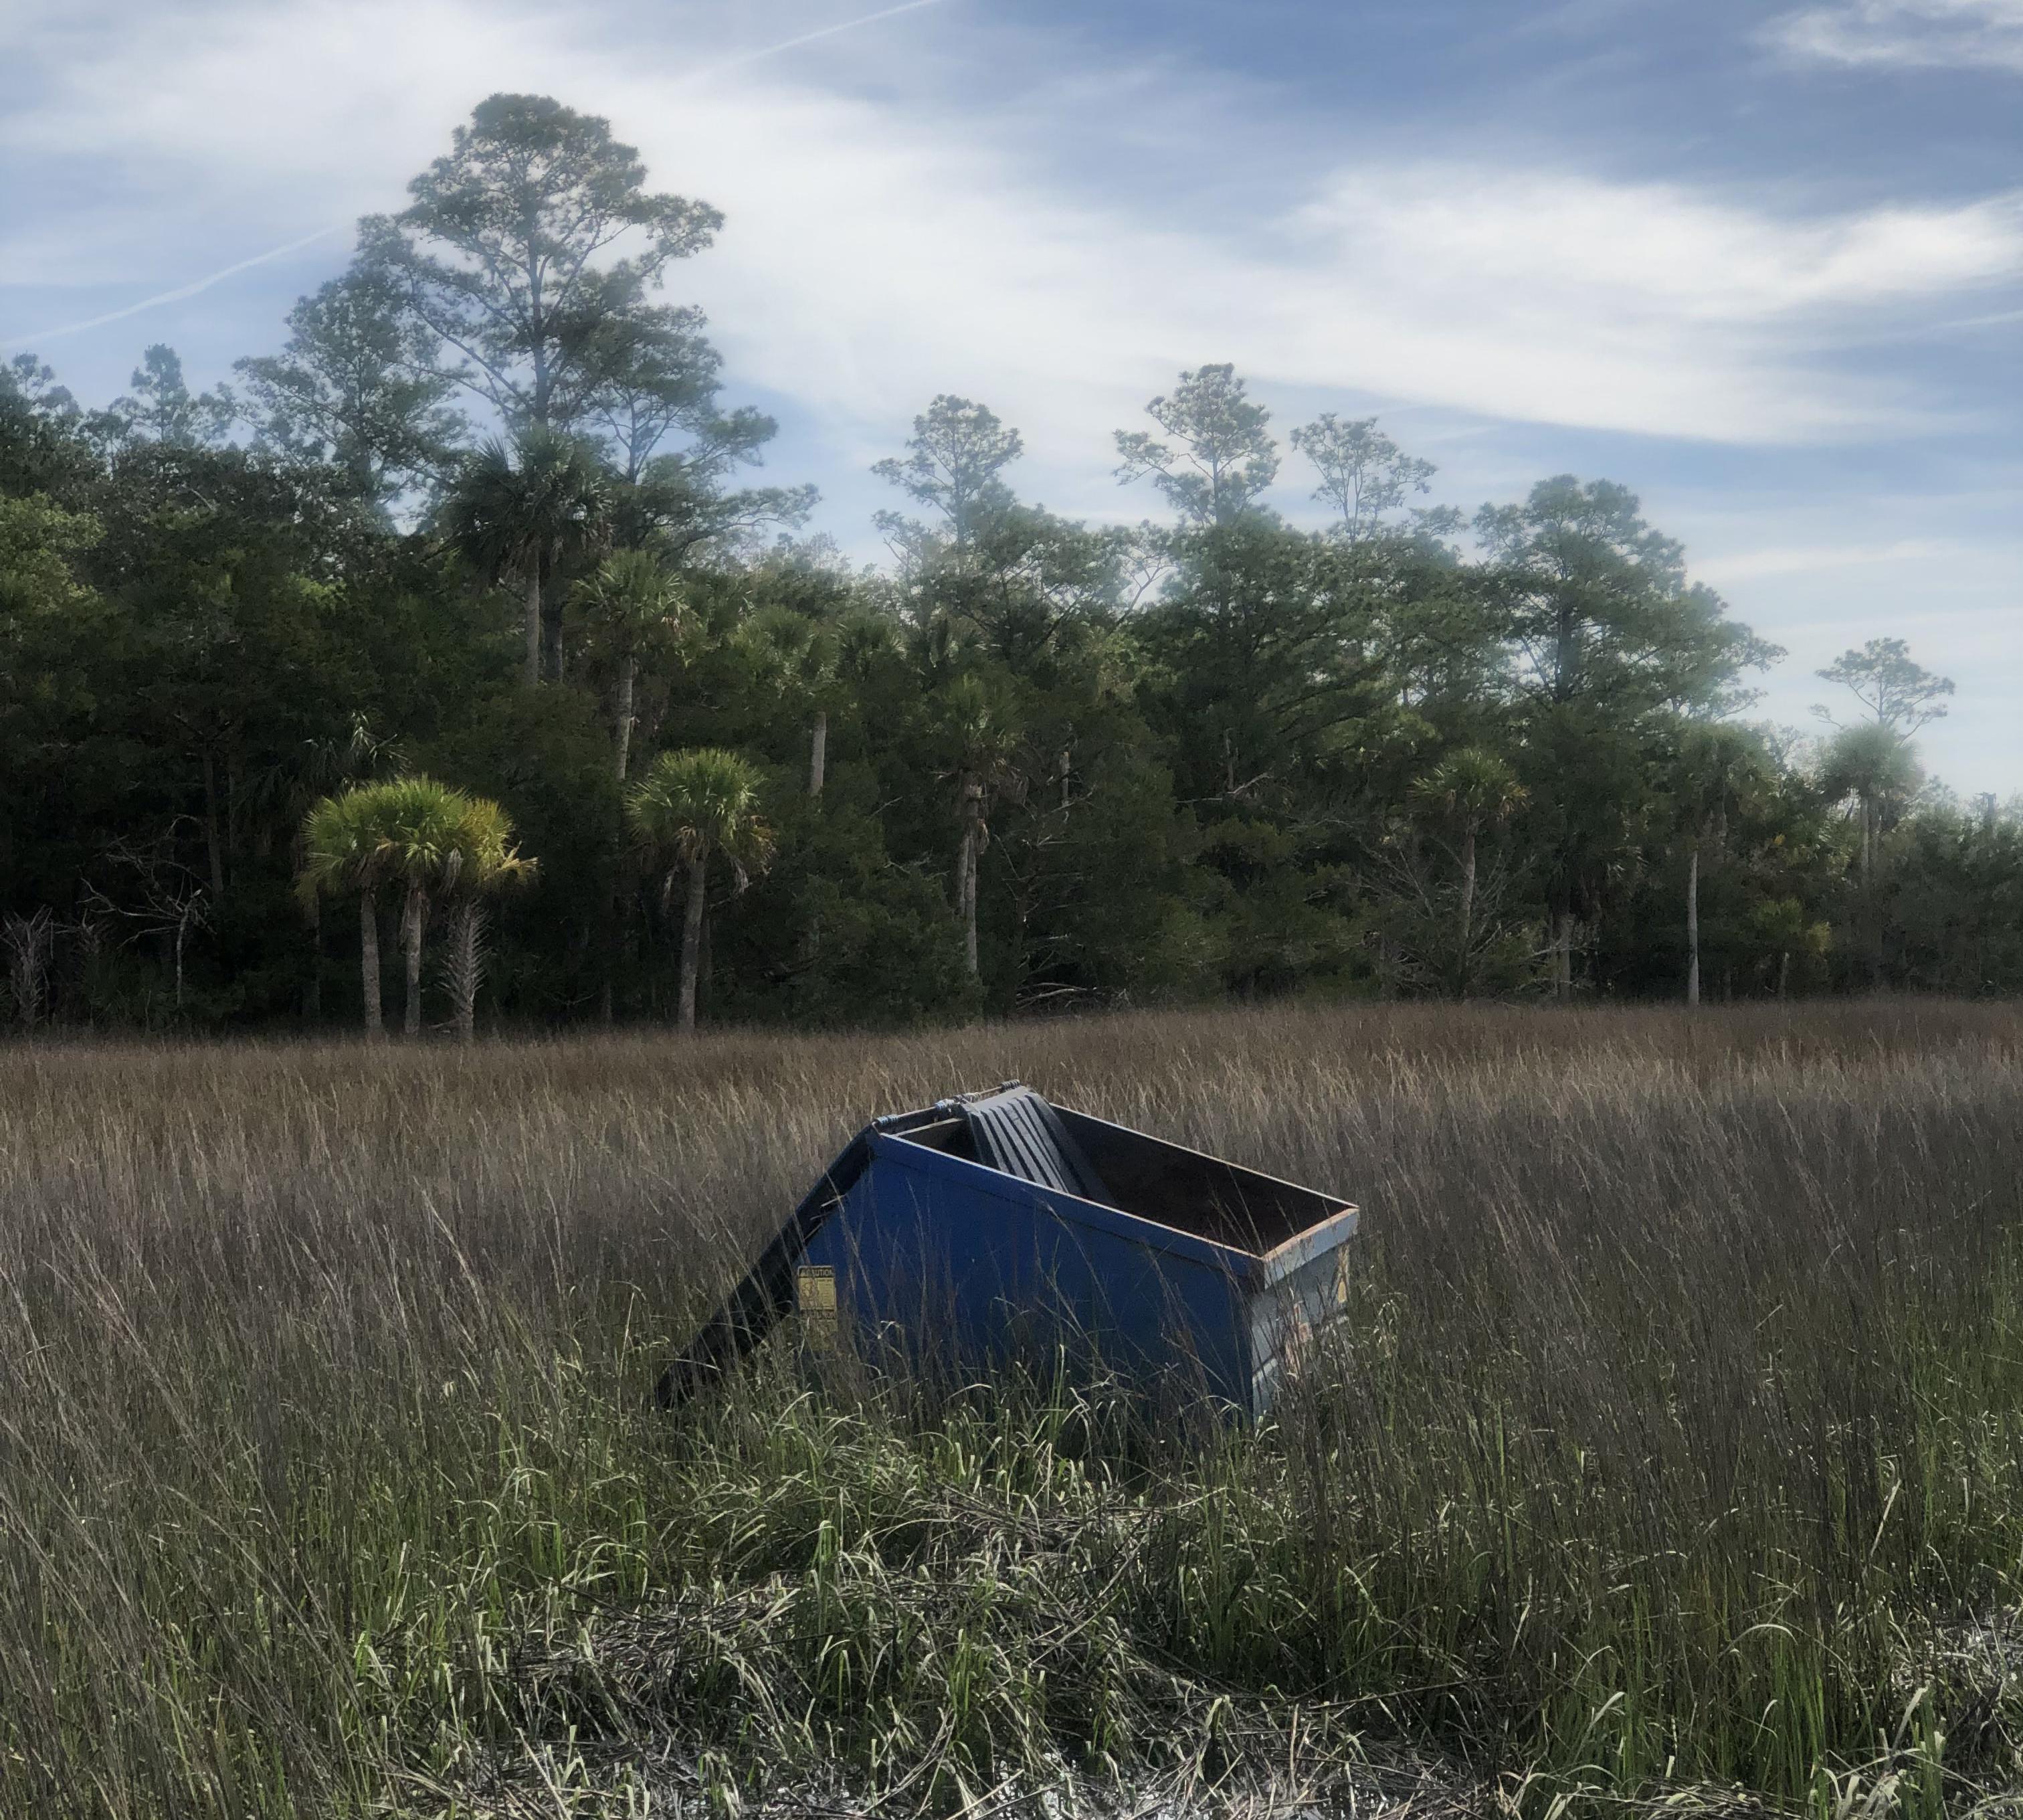 A dumpster in a marsh.